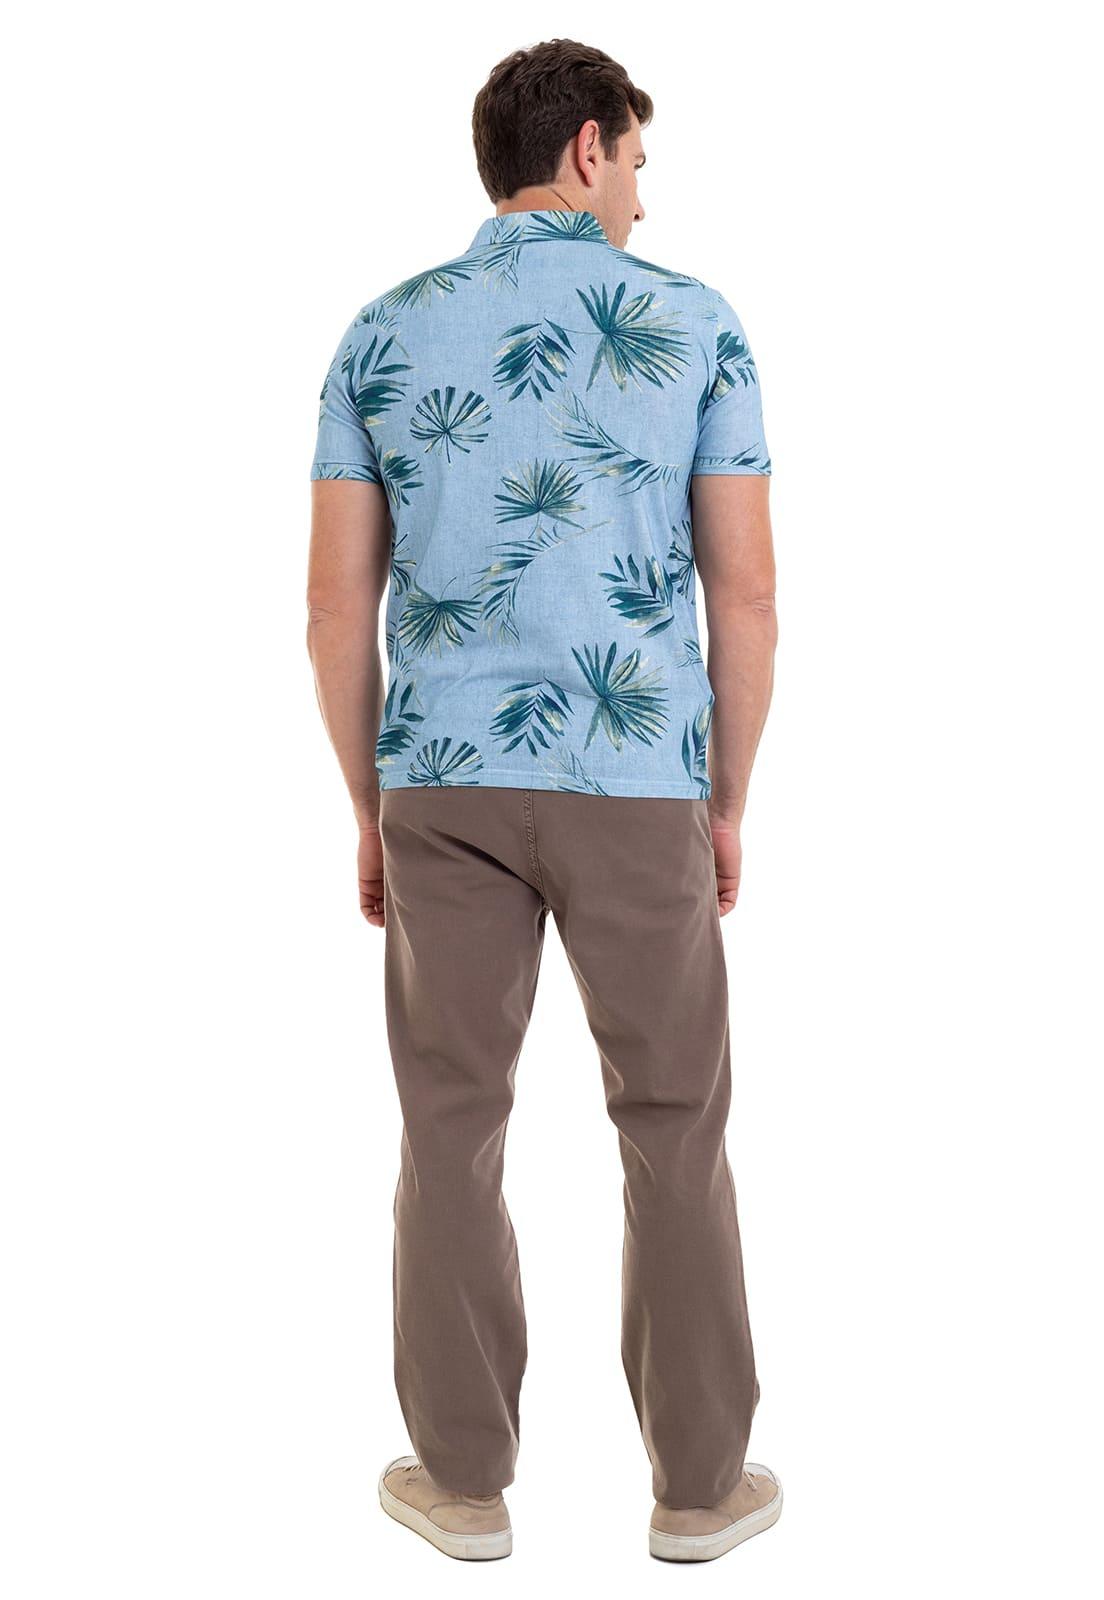 Camisa de Abotoamento Hifen